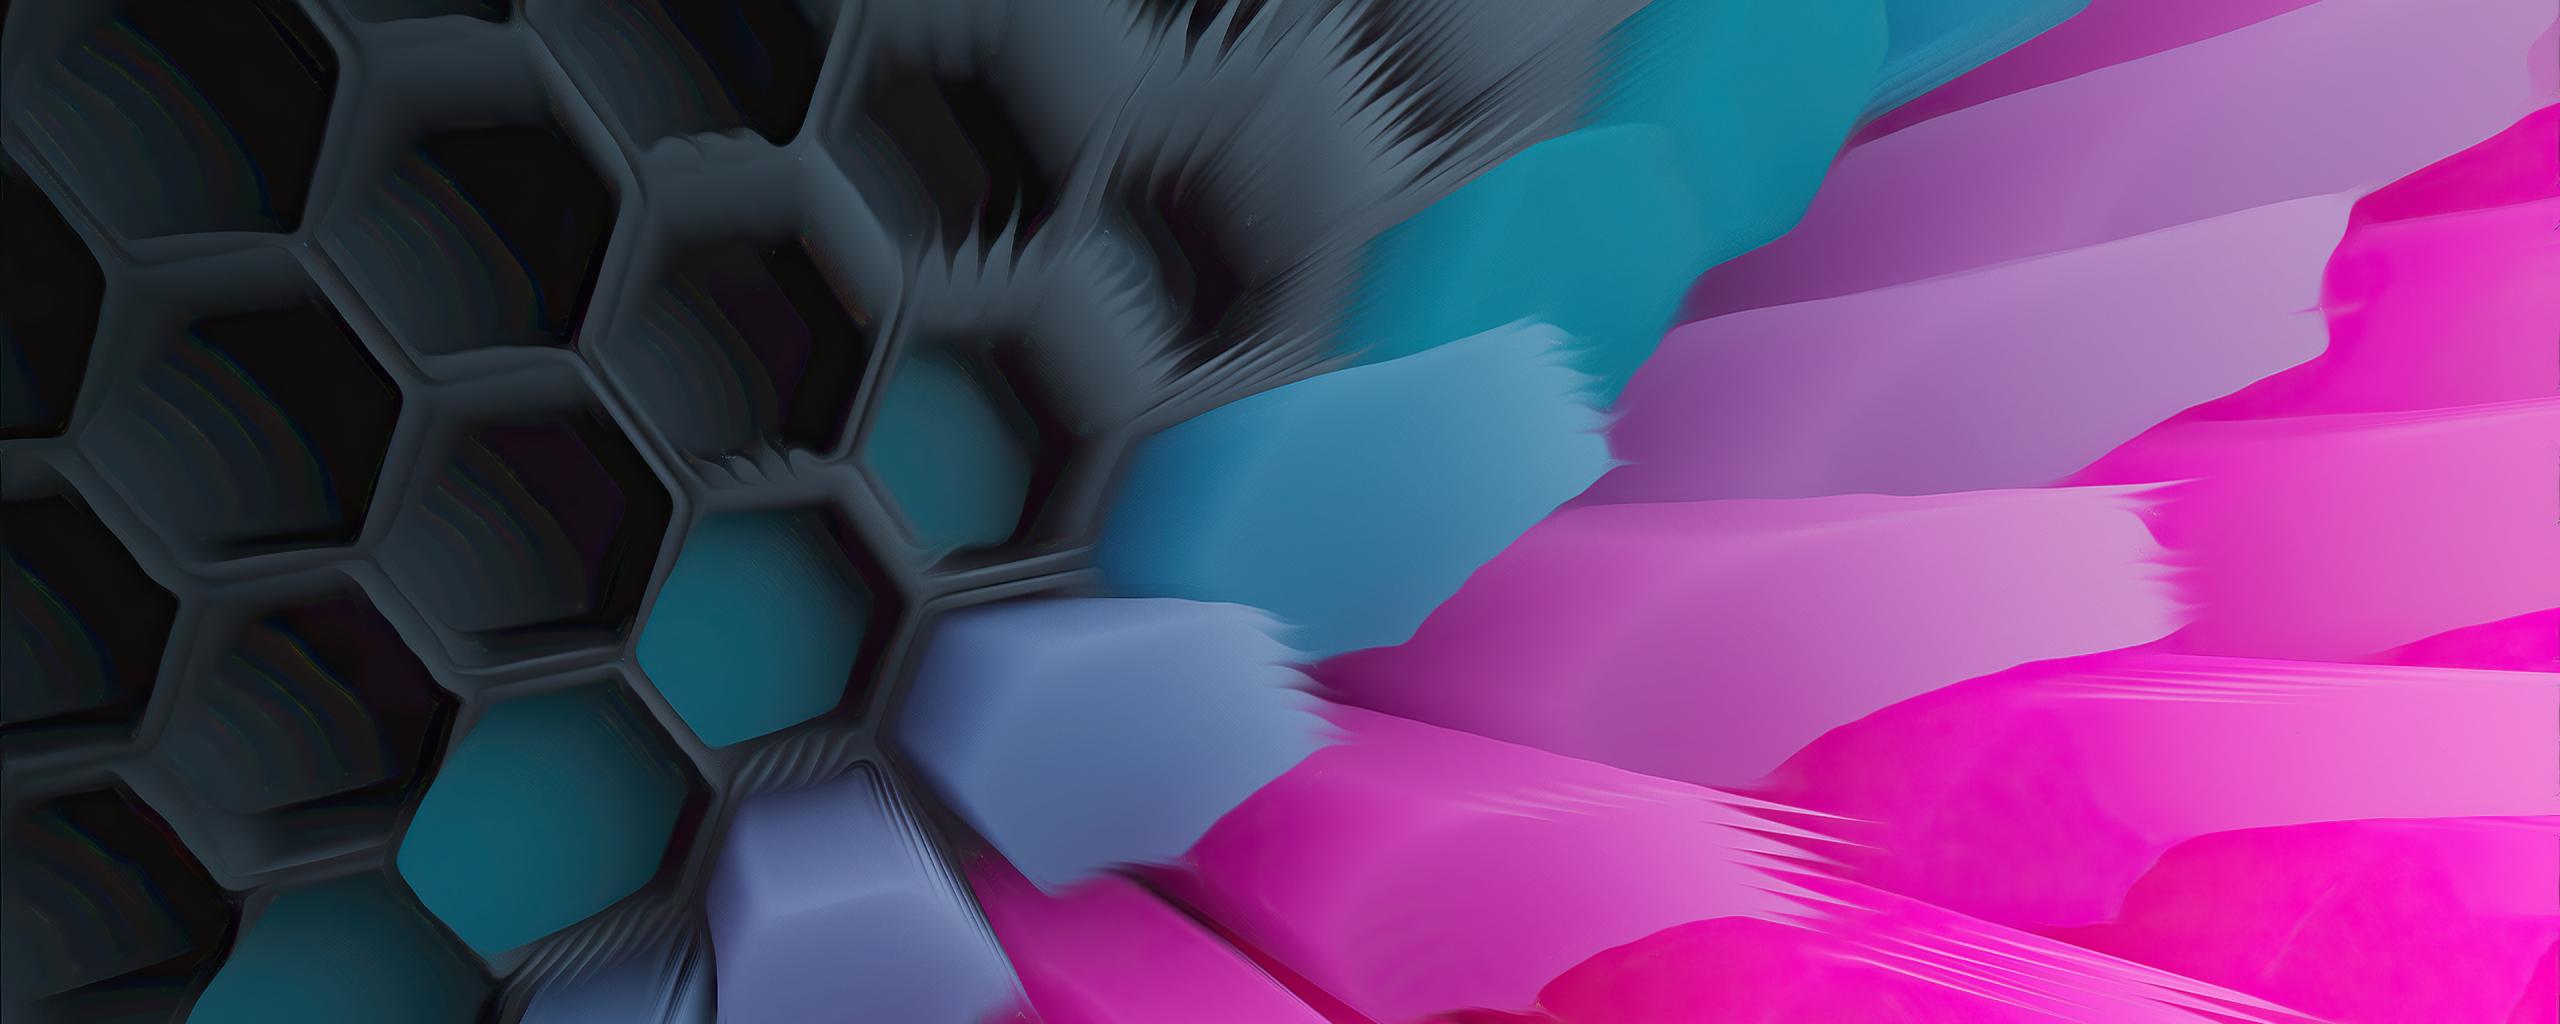 Pink Blue 4K Hexagon Wallpaper in 2560x1024 Resolution